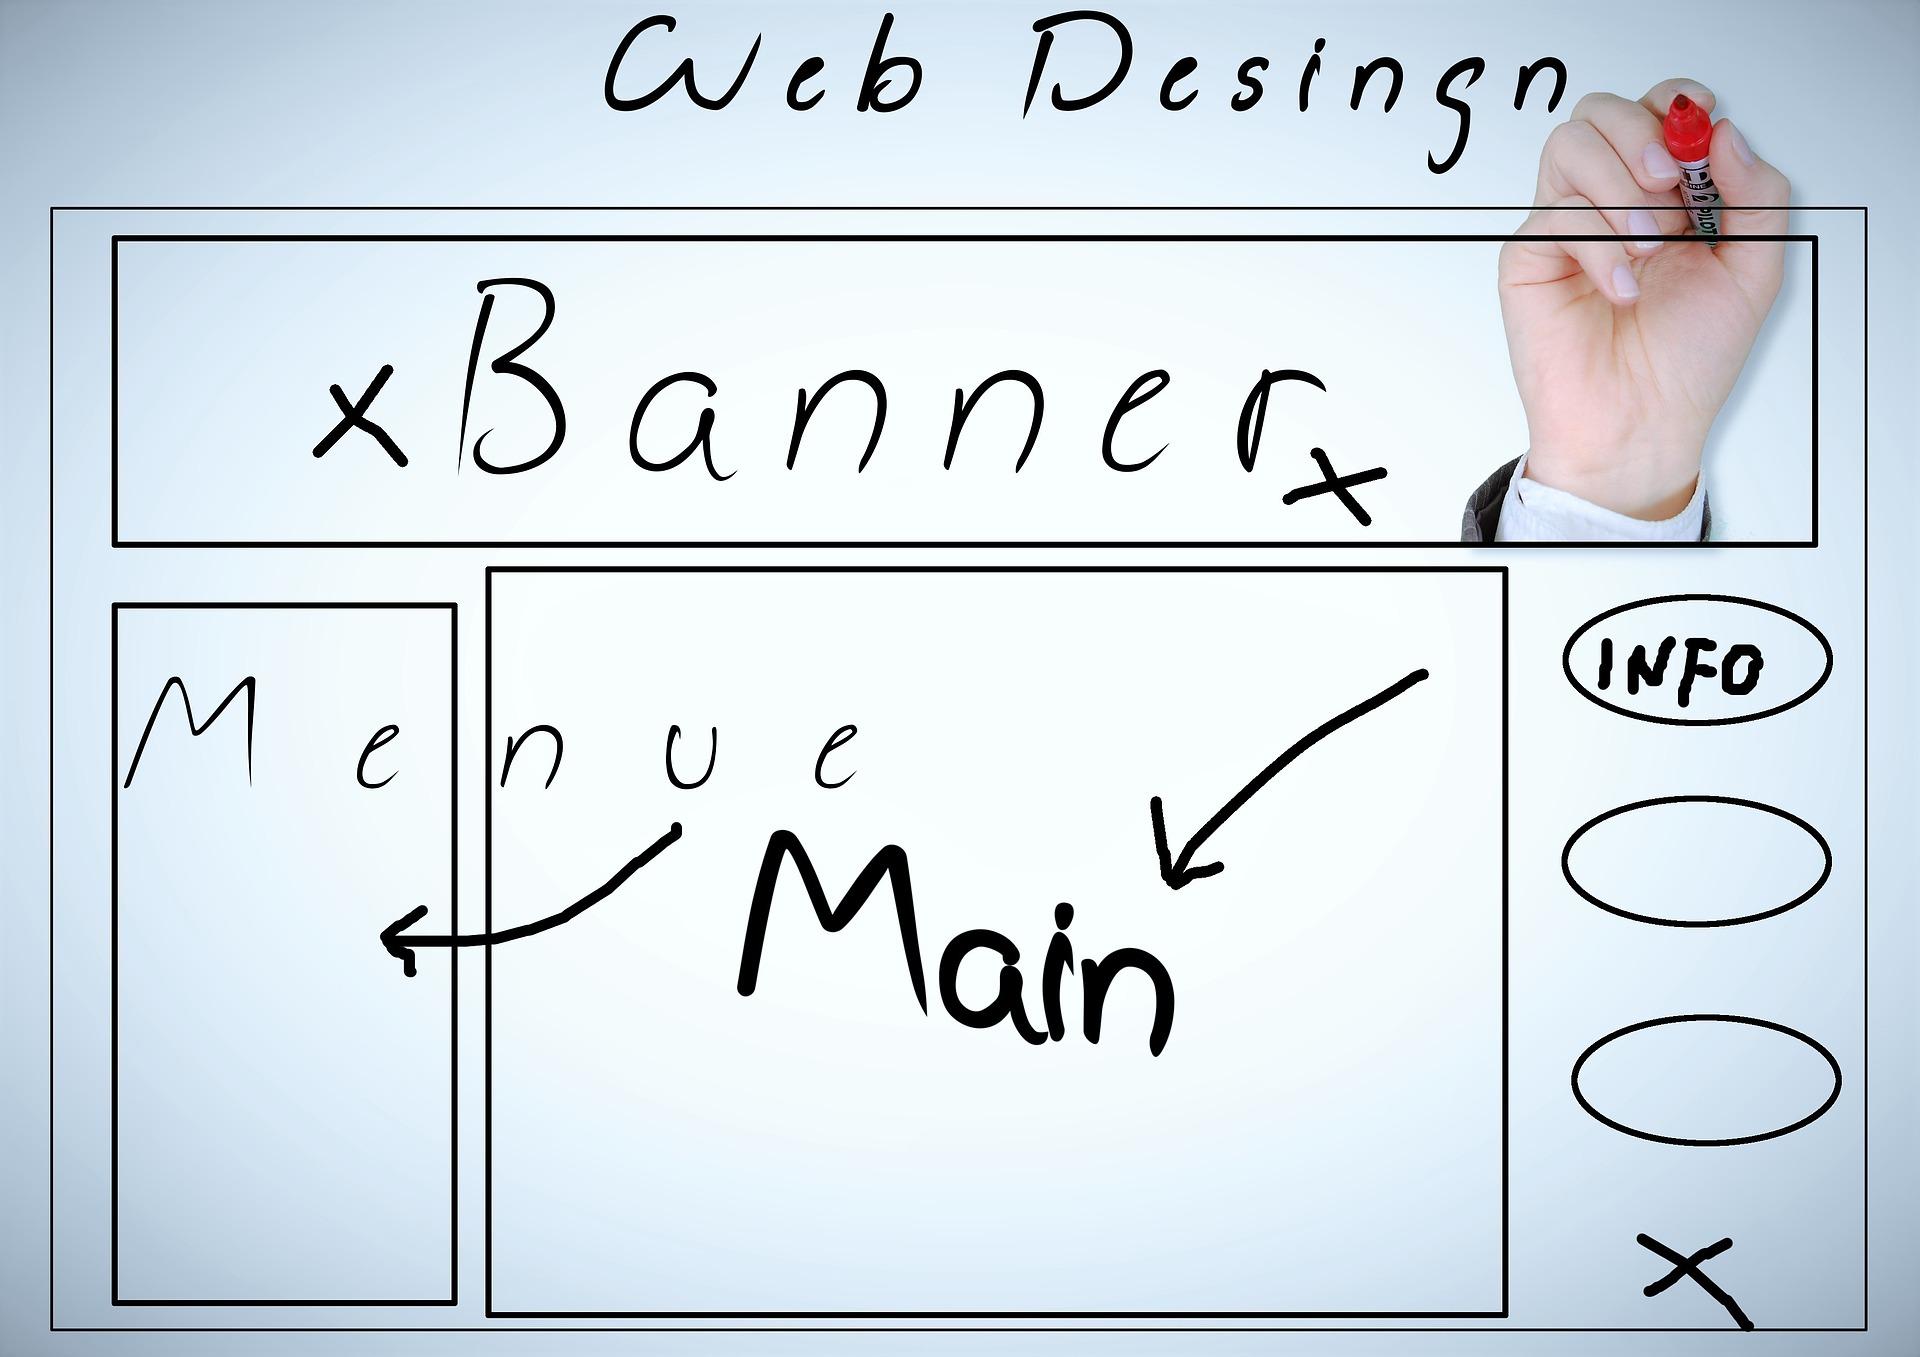 webdesign thrust marketing